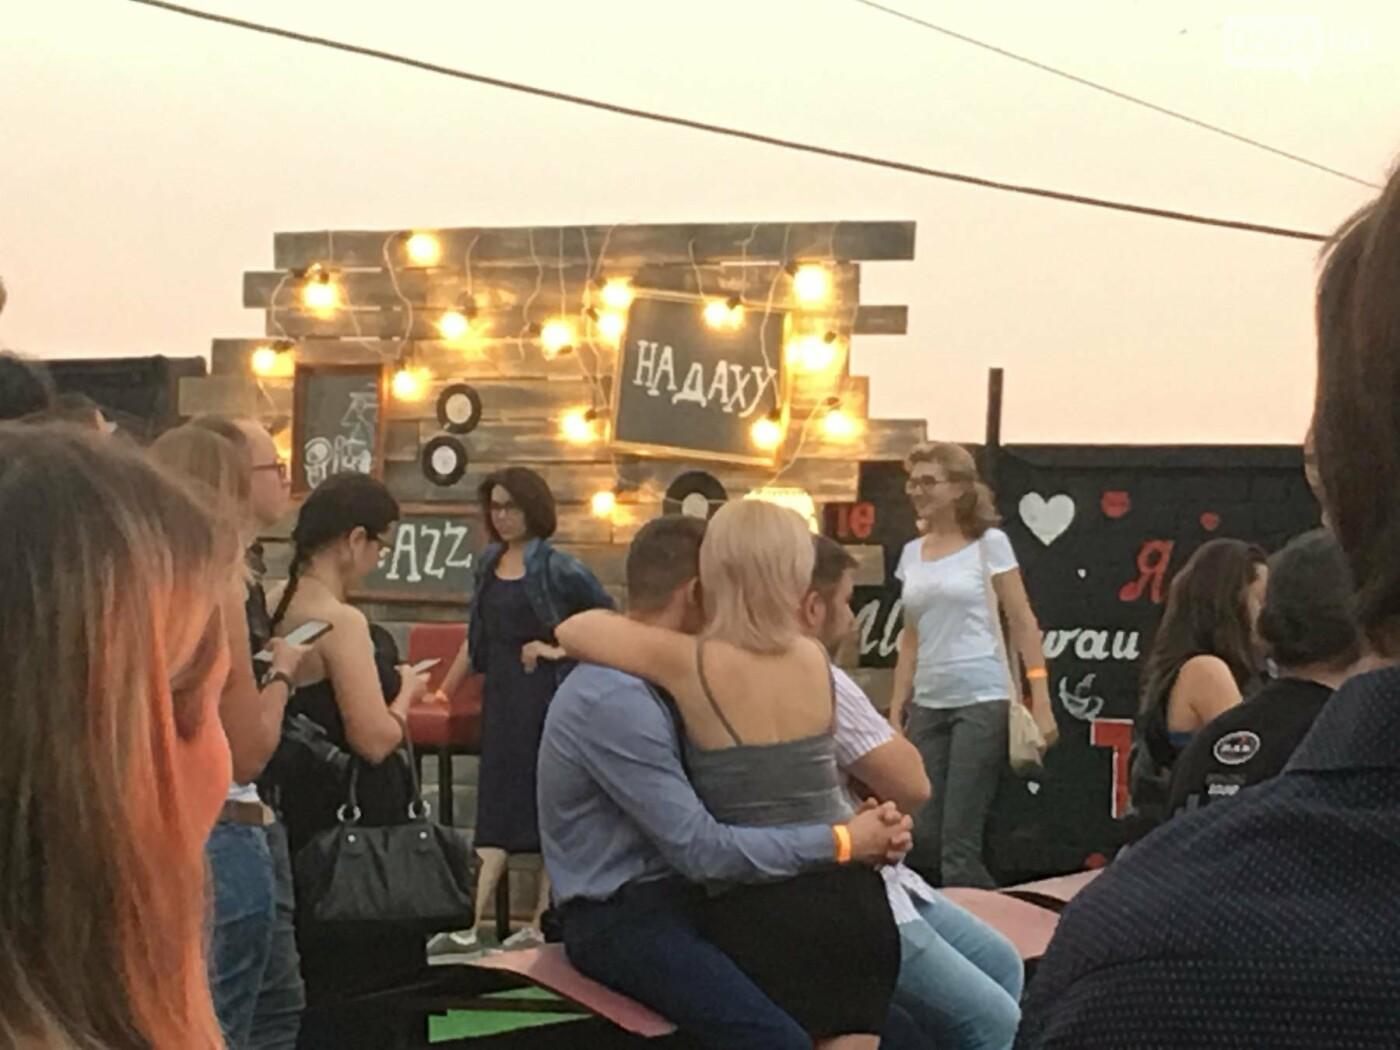 Сотни криворожан встречали закат на крыше отеля под мелодии джаза, - ФОТО, ВИДЕО, фото-8